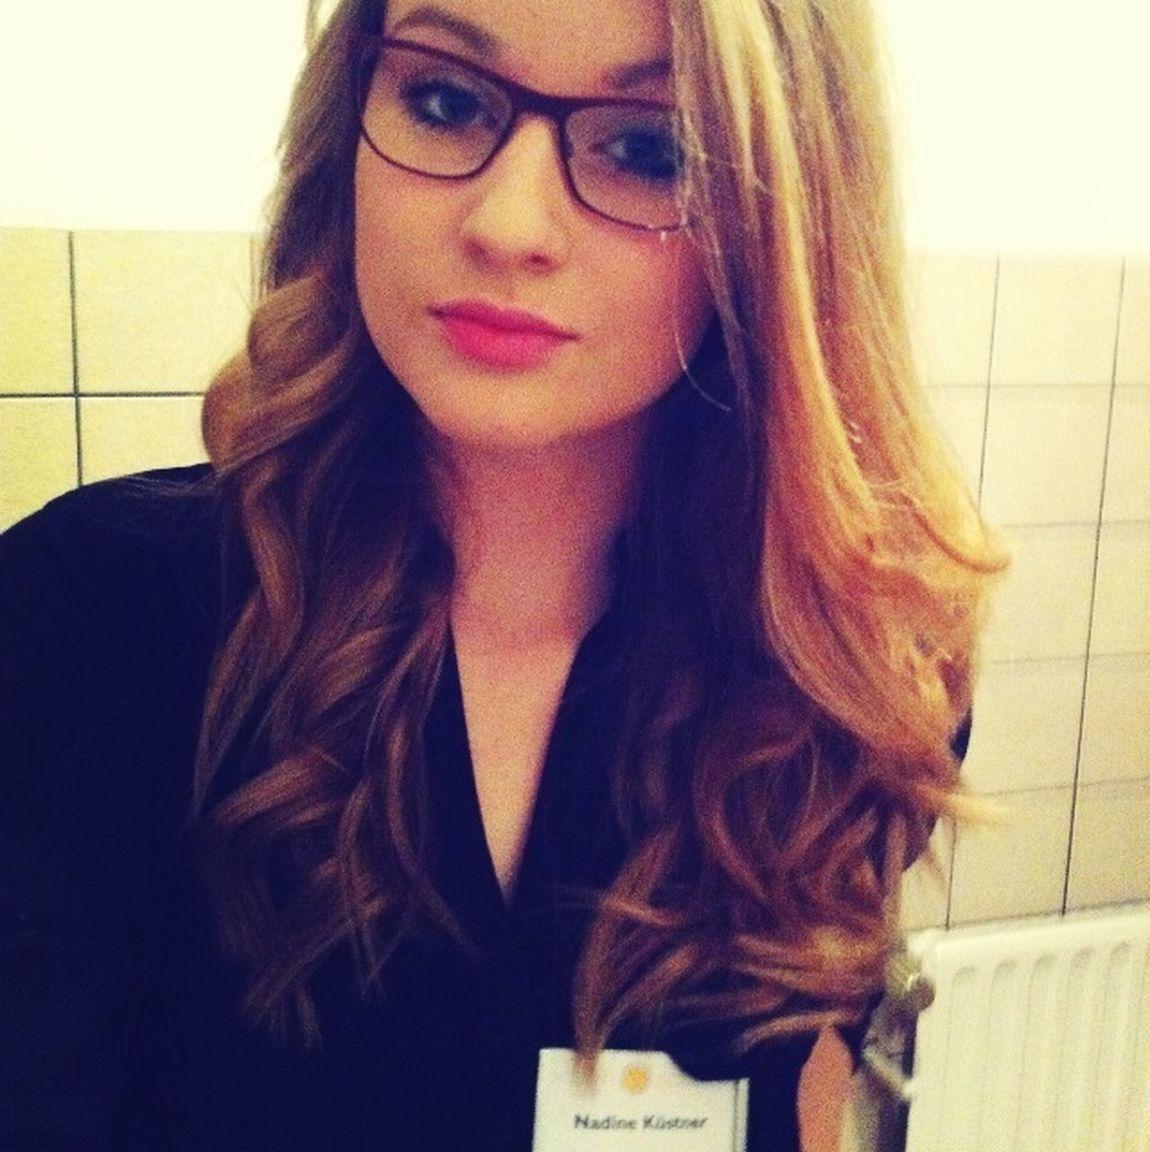 Beauty Bad Teacher. No Smile Today